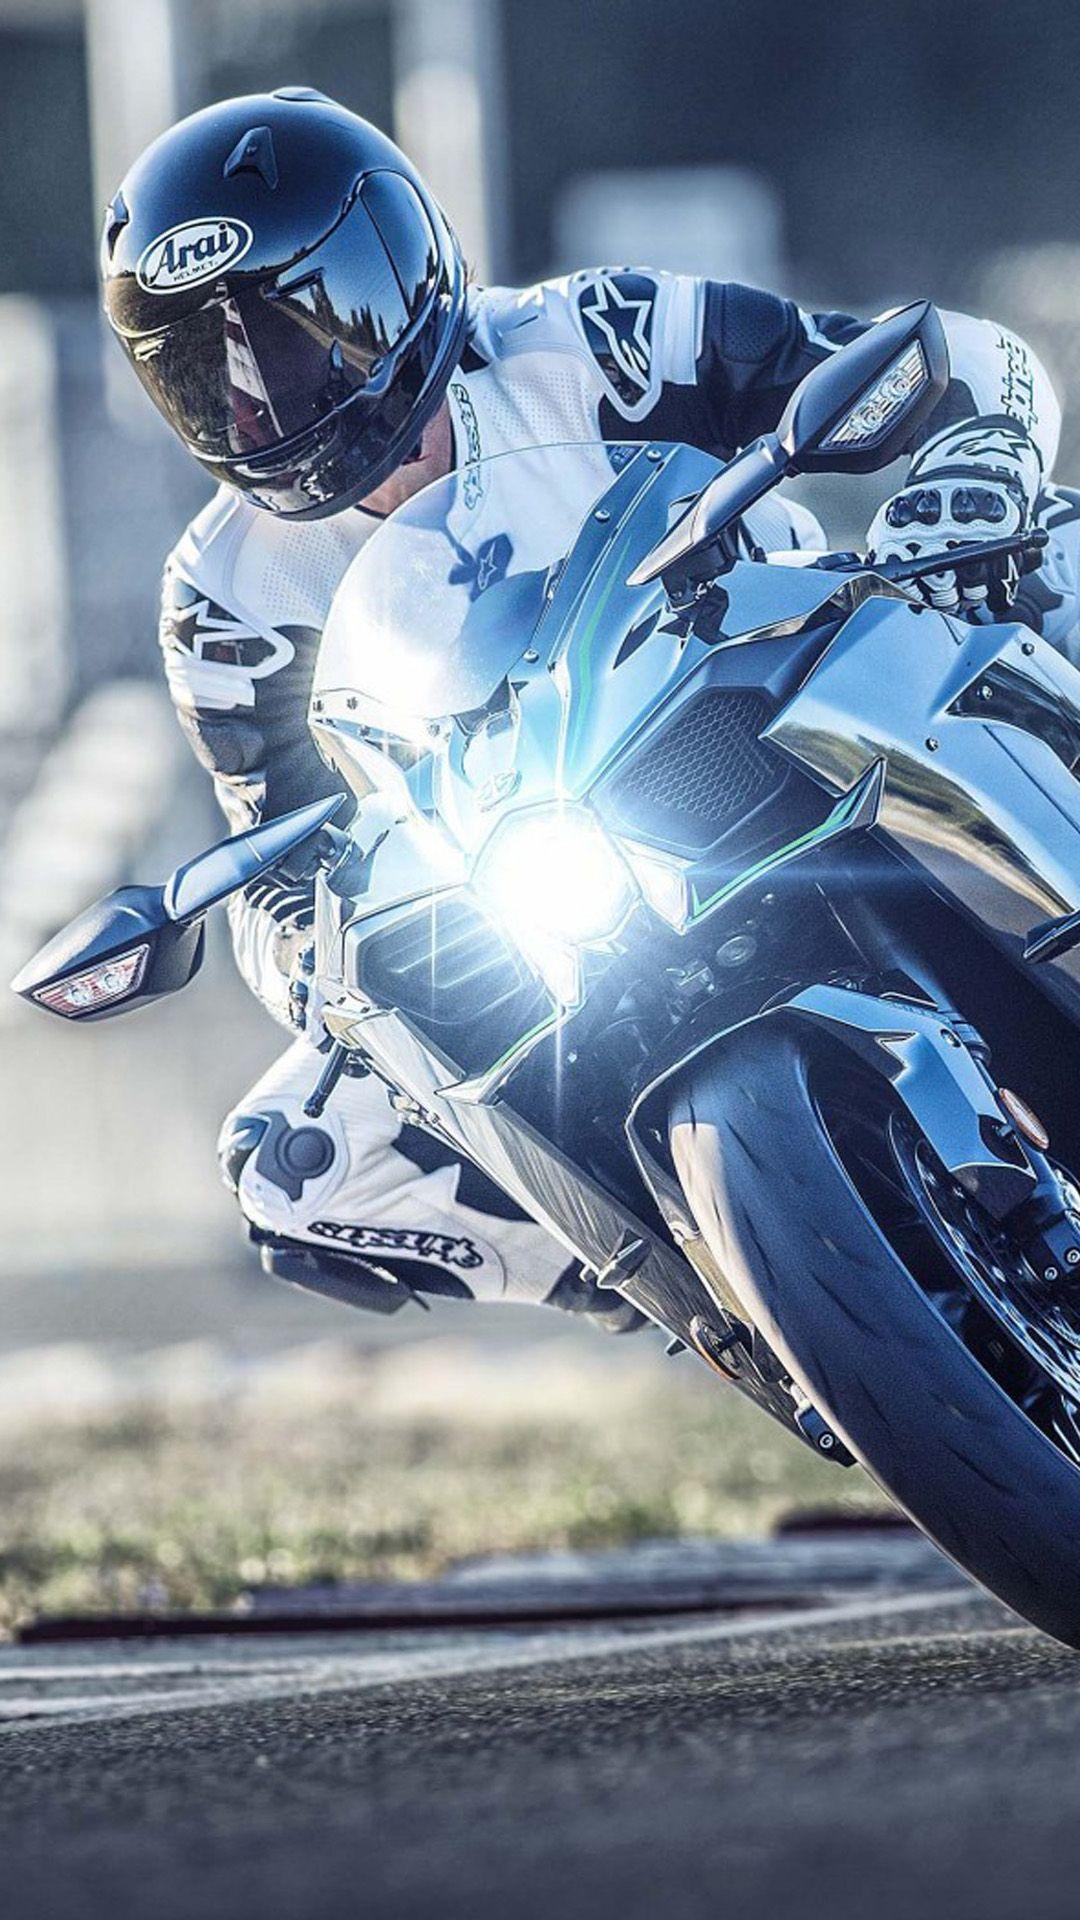 Kawasaki Ninja H2 4k Ultra Hd Mobile Wallpaper Kawasaki Ninja Kawasaki Bikes Sports Wallpapers